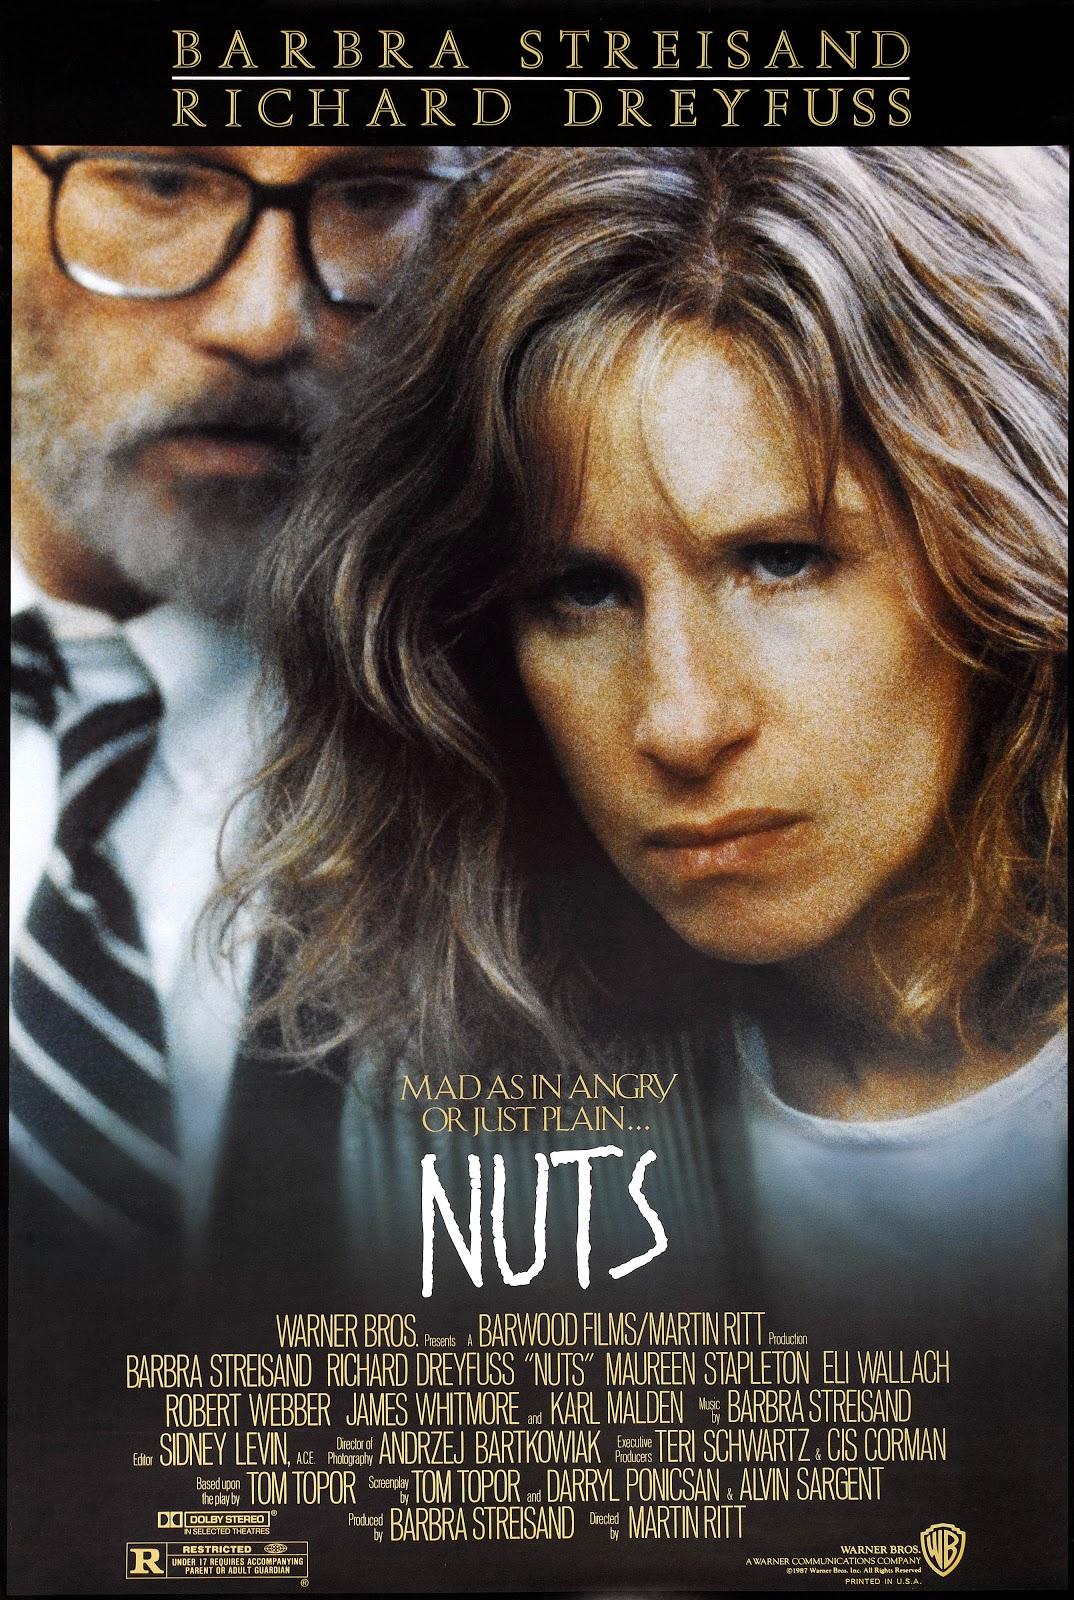 http://3.bp.blogspot.com/-oDwsKlXoHFo/Tx1HNBzgRGI/AAAAAAAAZCg/9zwjYN8Hv8g/s1600/BARBRA+STREISAND+film+1987.jpg